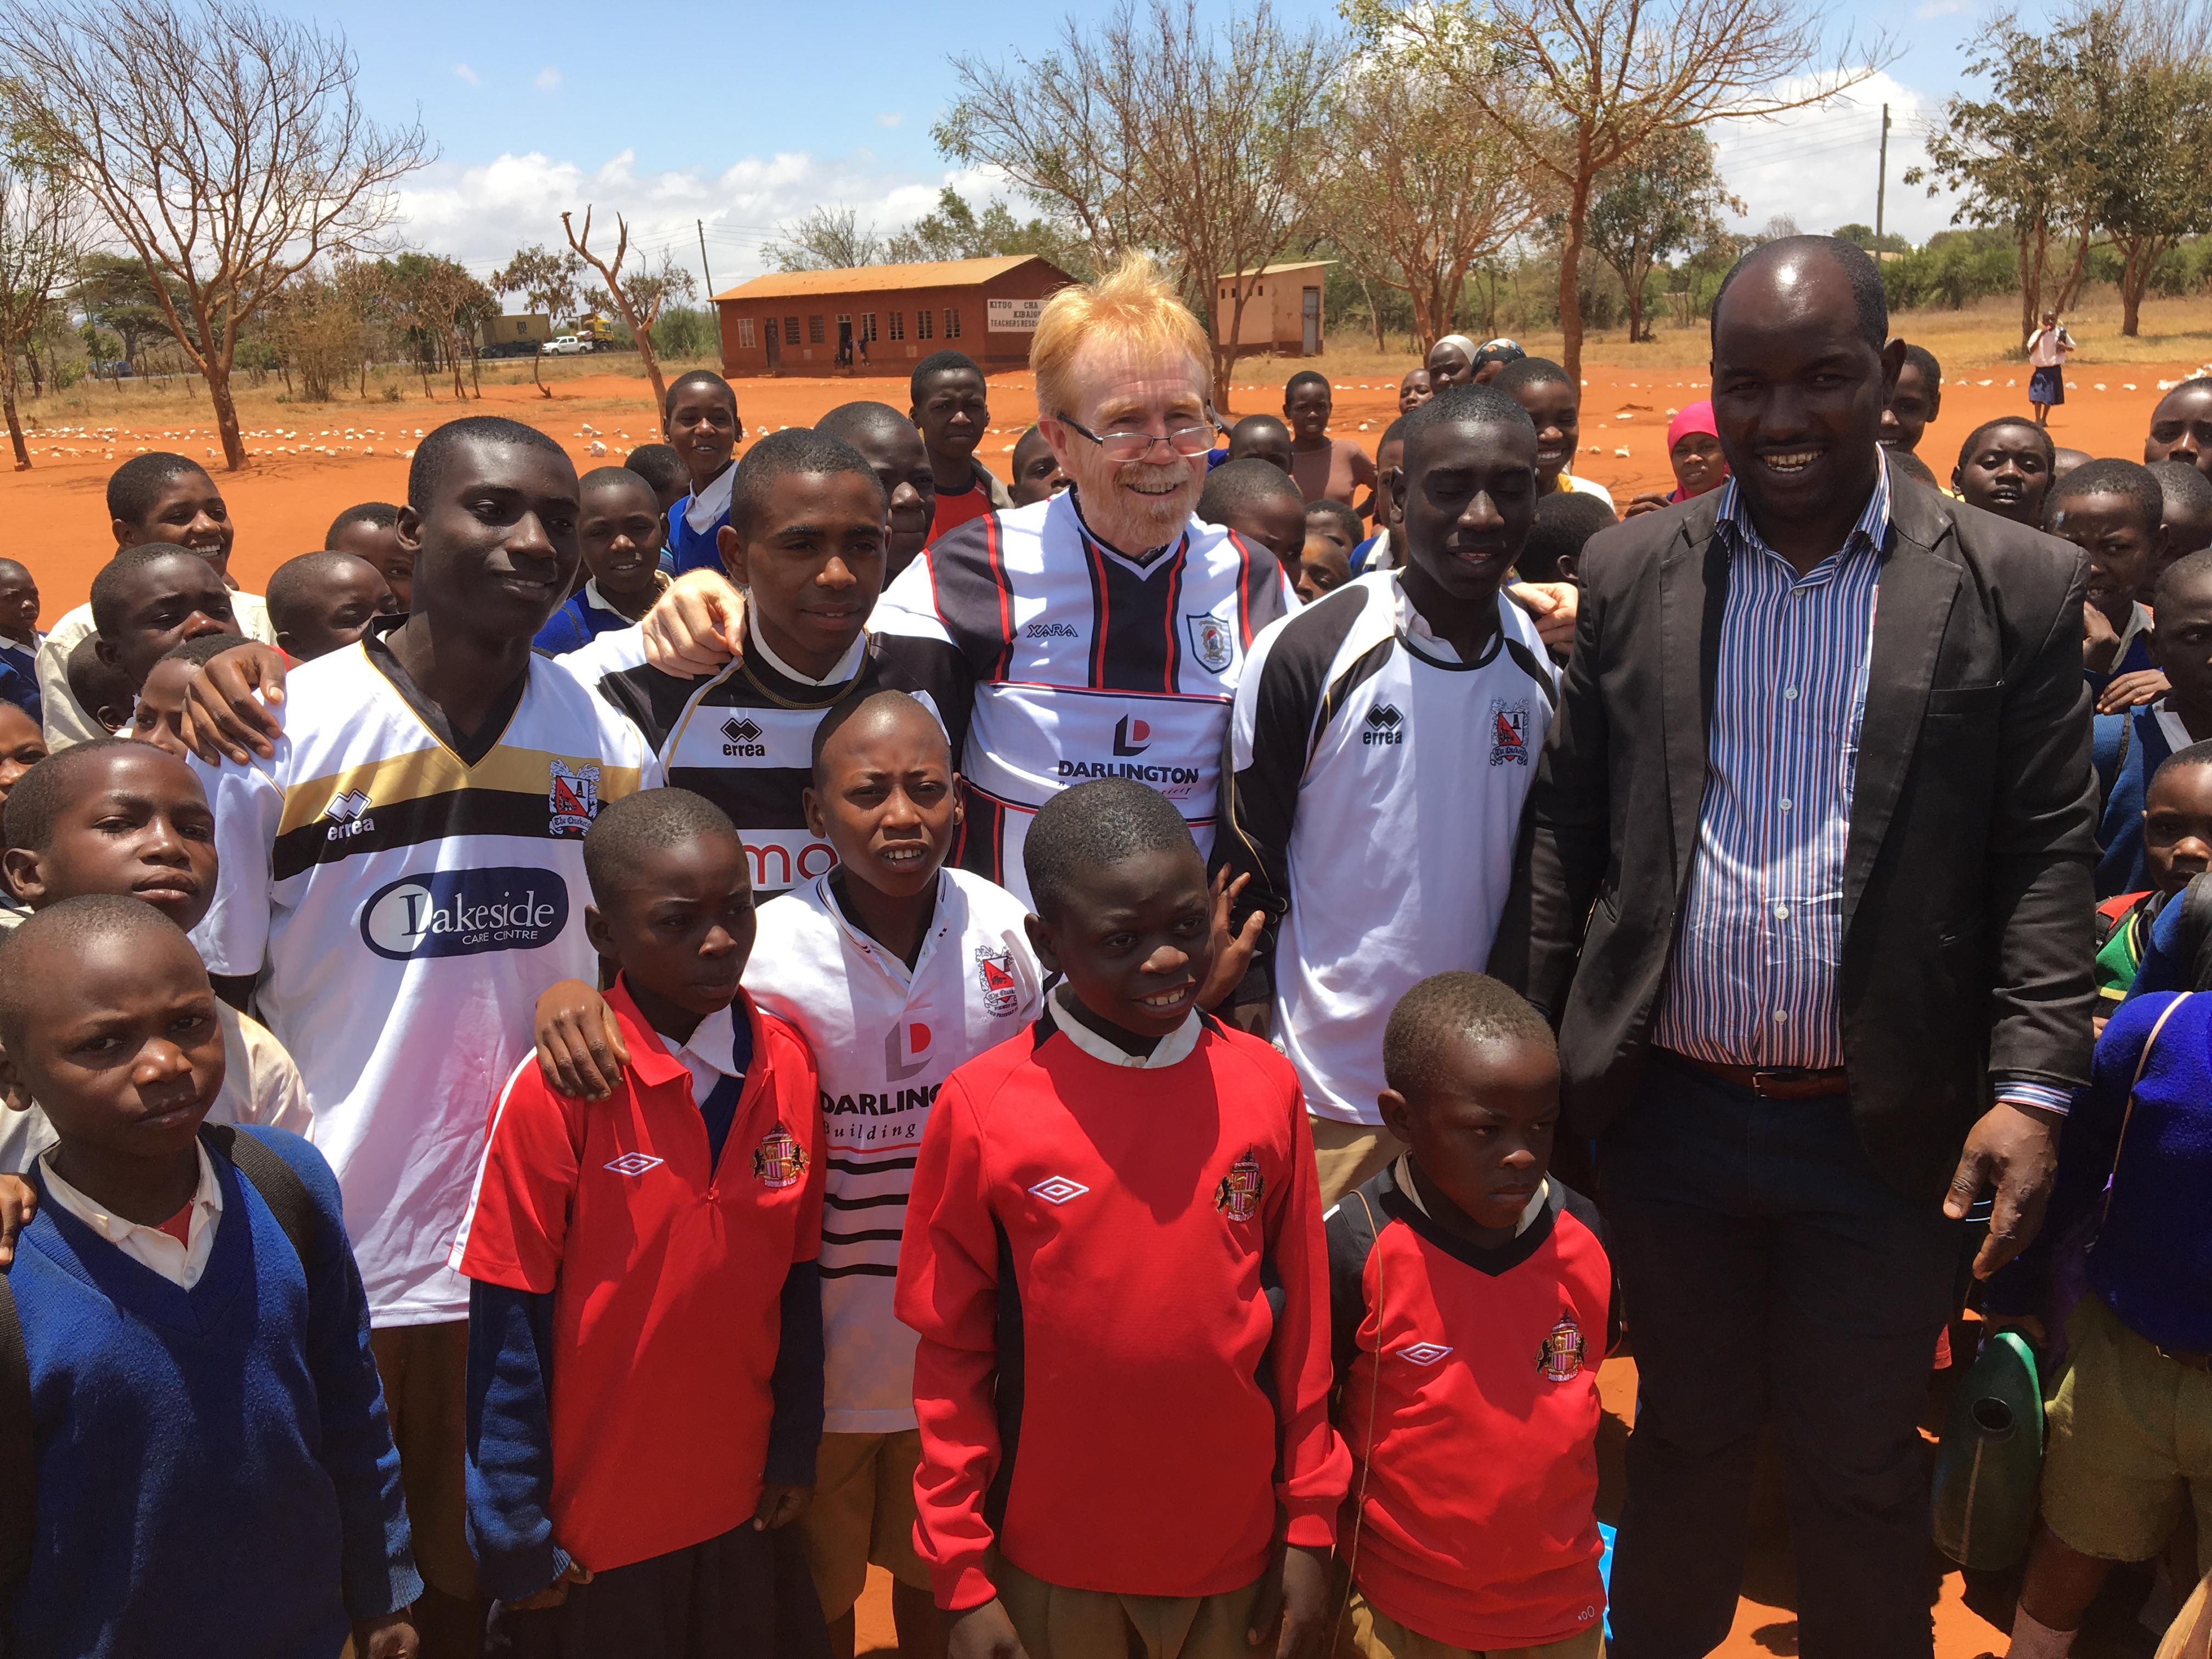 Shirts for Africa update - News - Darlington Football Club